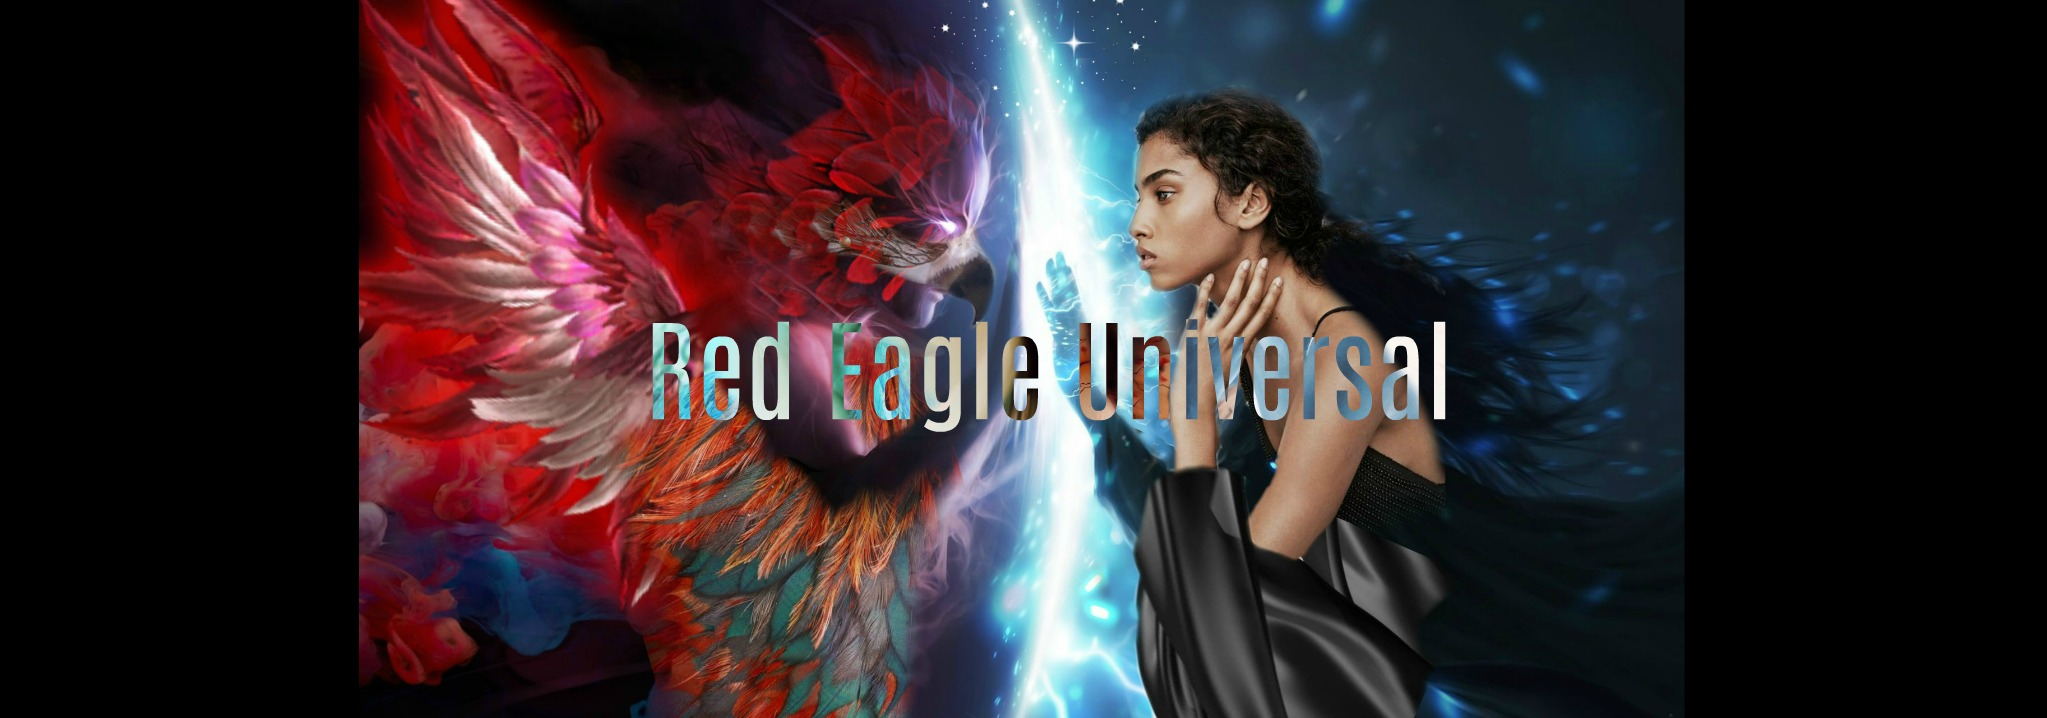 Red Eagle Universal 2.jpg